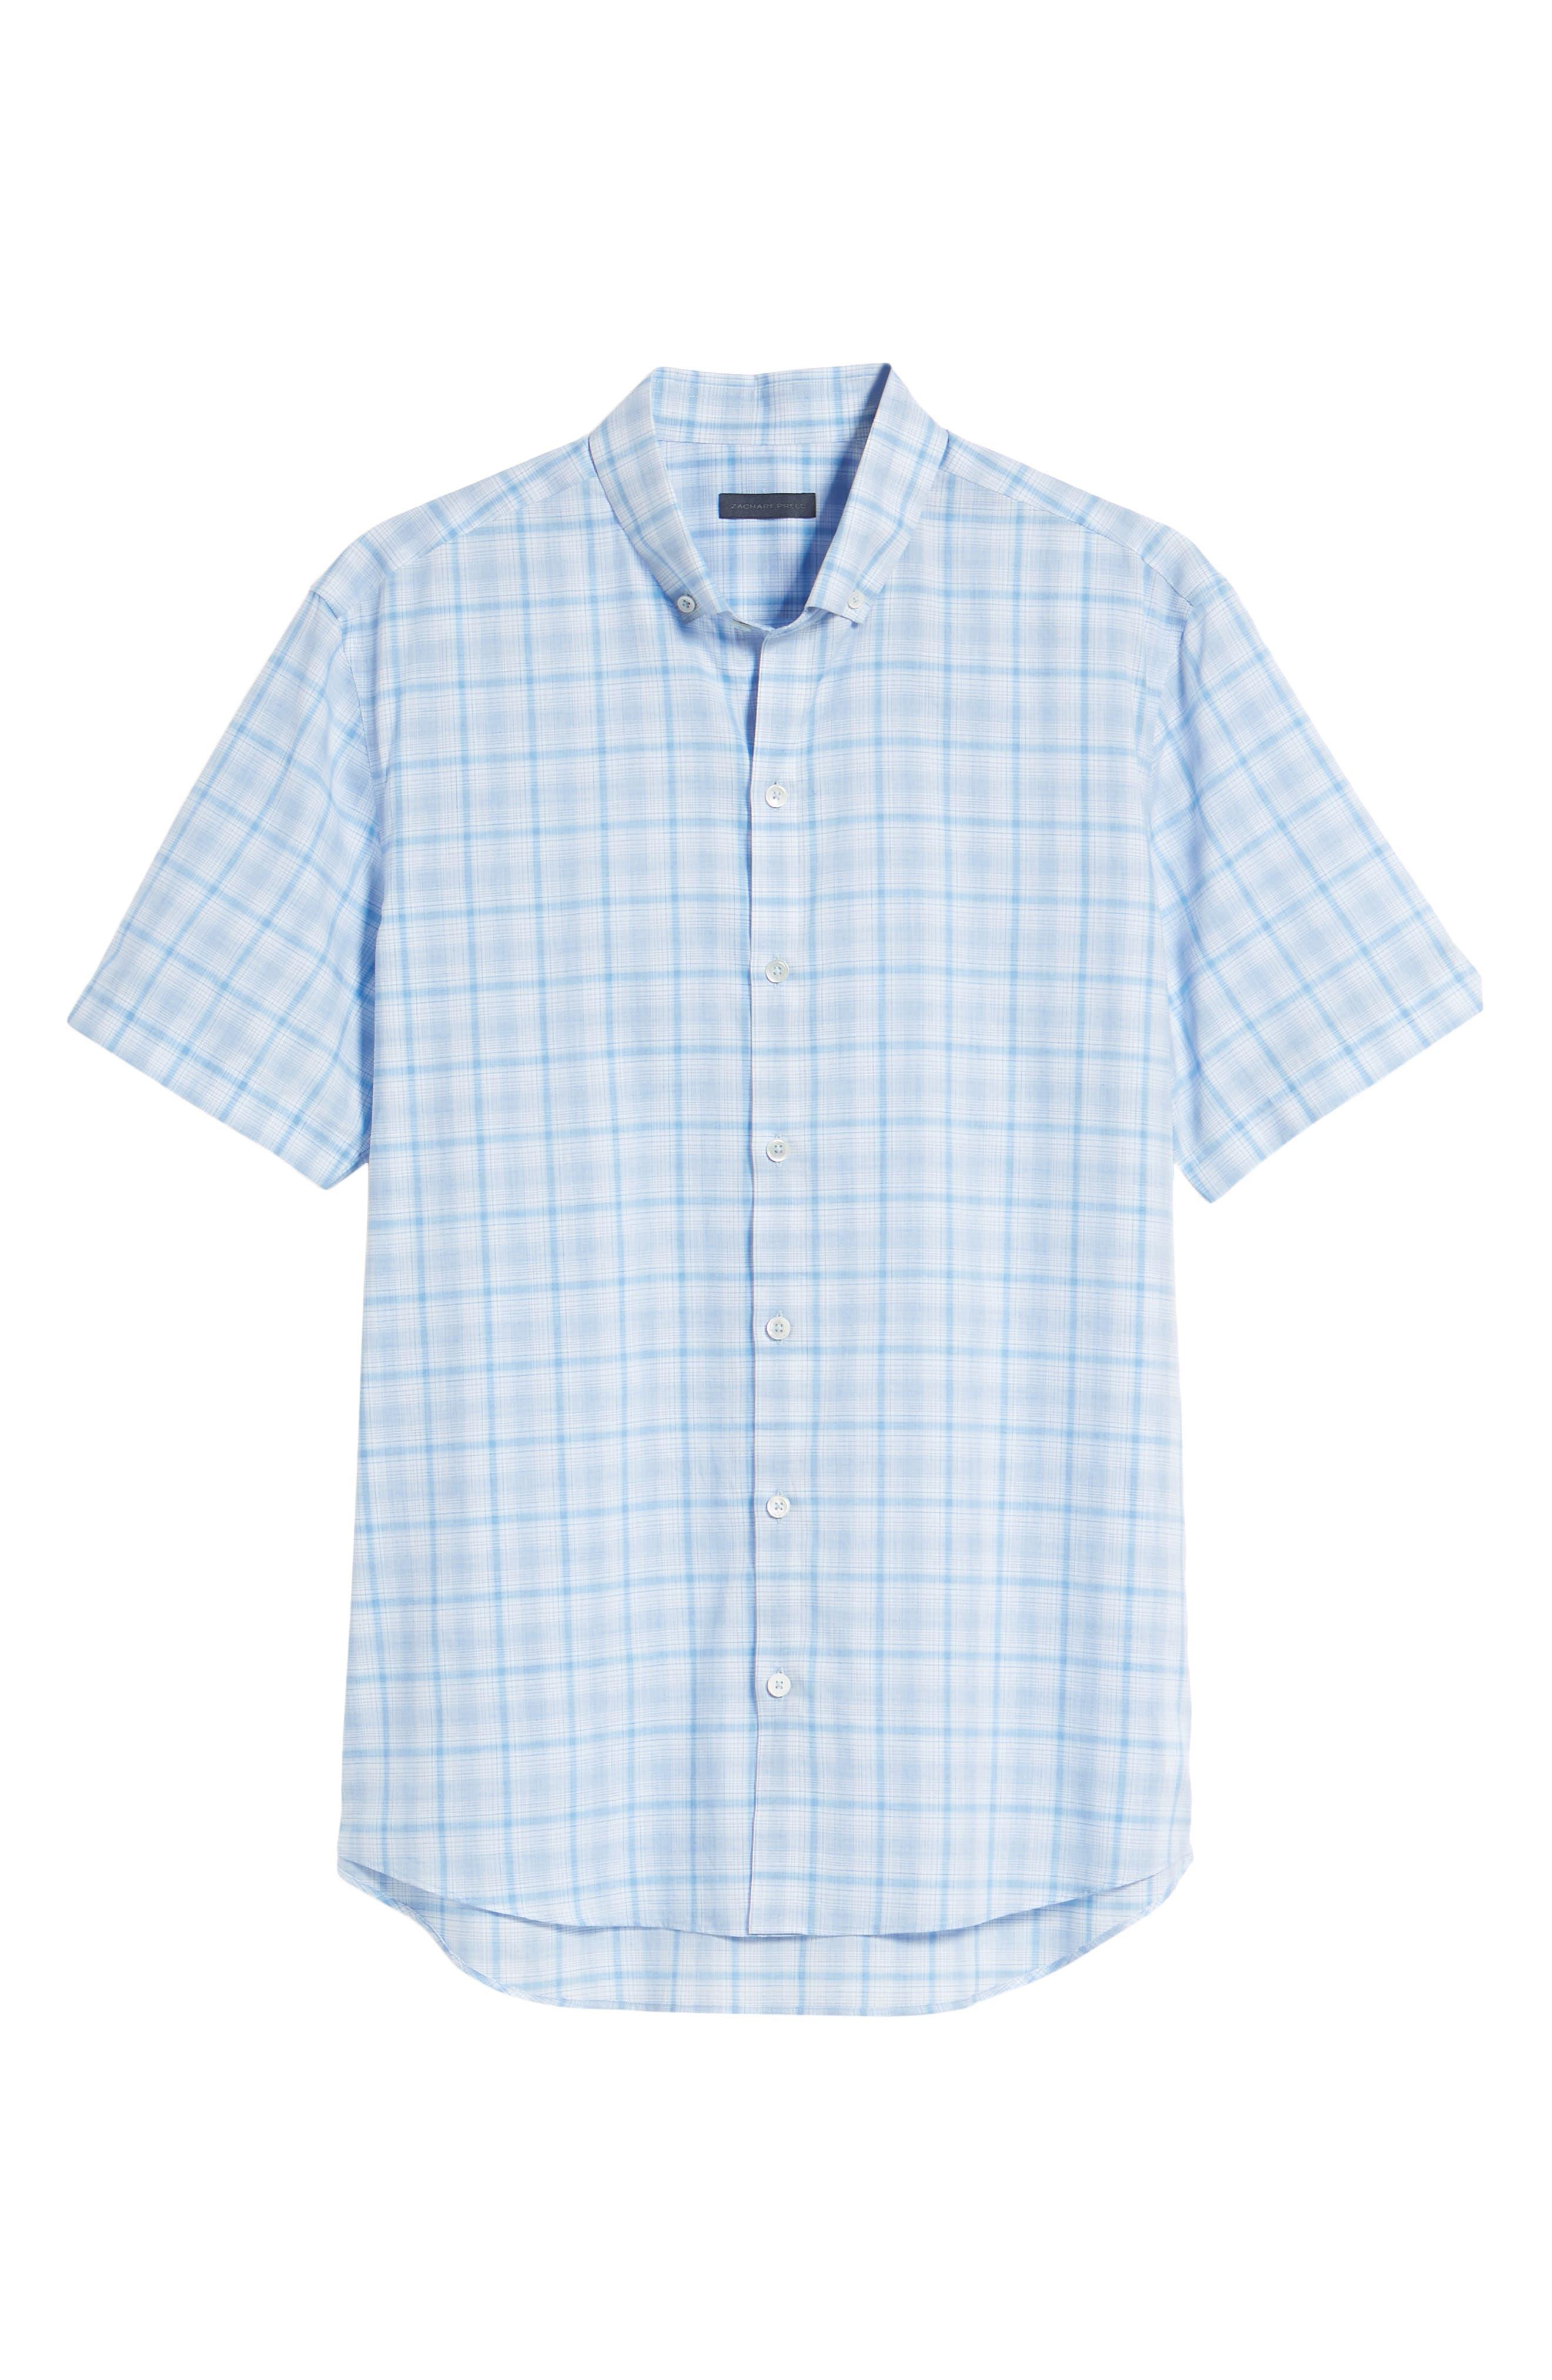 Kin Trim Fit Grid Plaid Sport Shirt,                             Alternate thumbnail 6, color,                             Light Blue